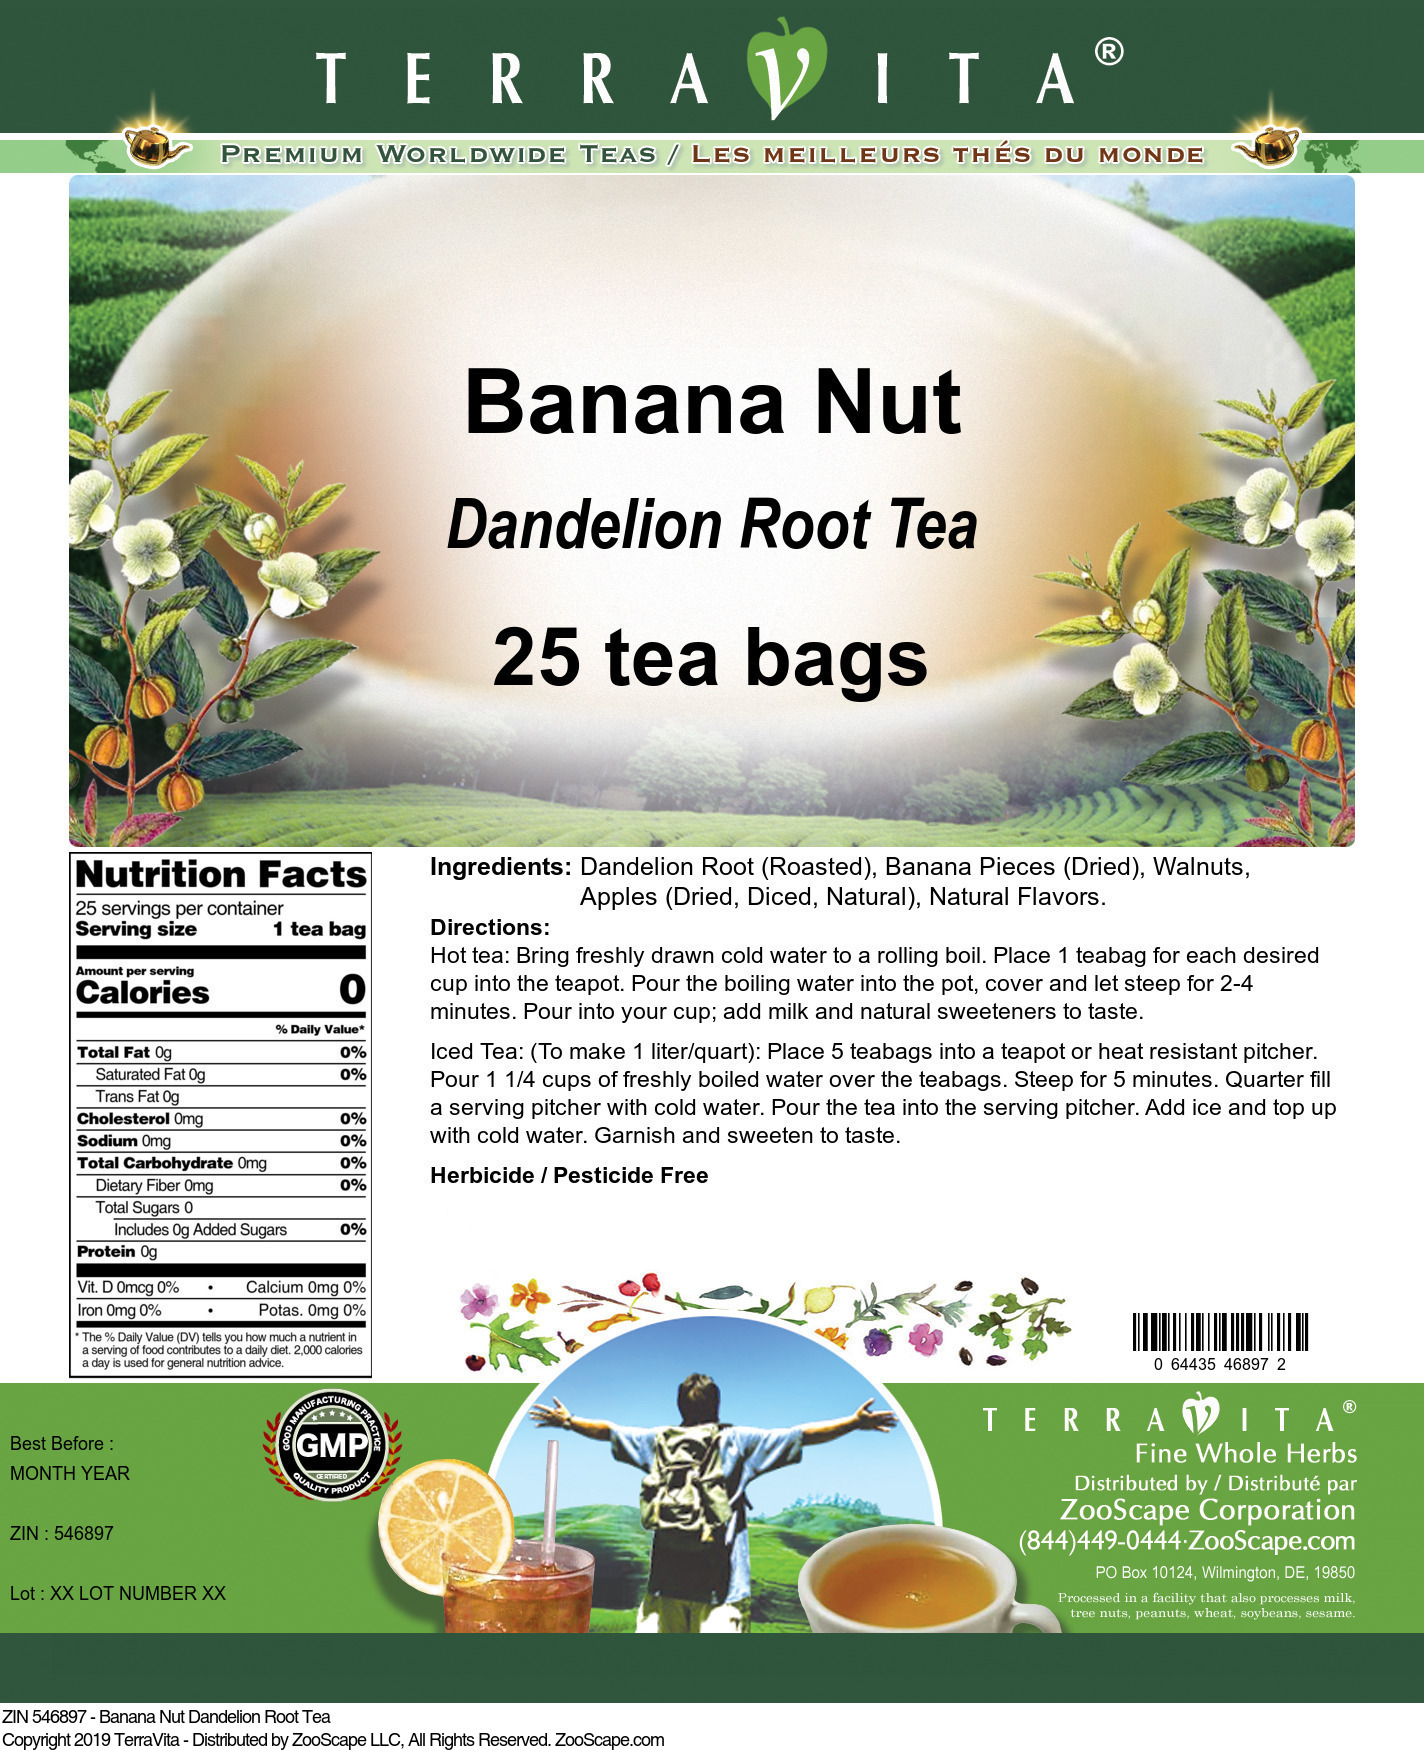 Banana Nut Dandelion Root